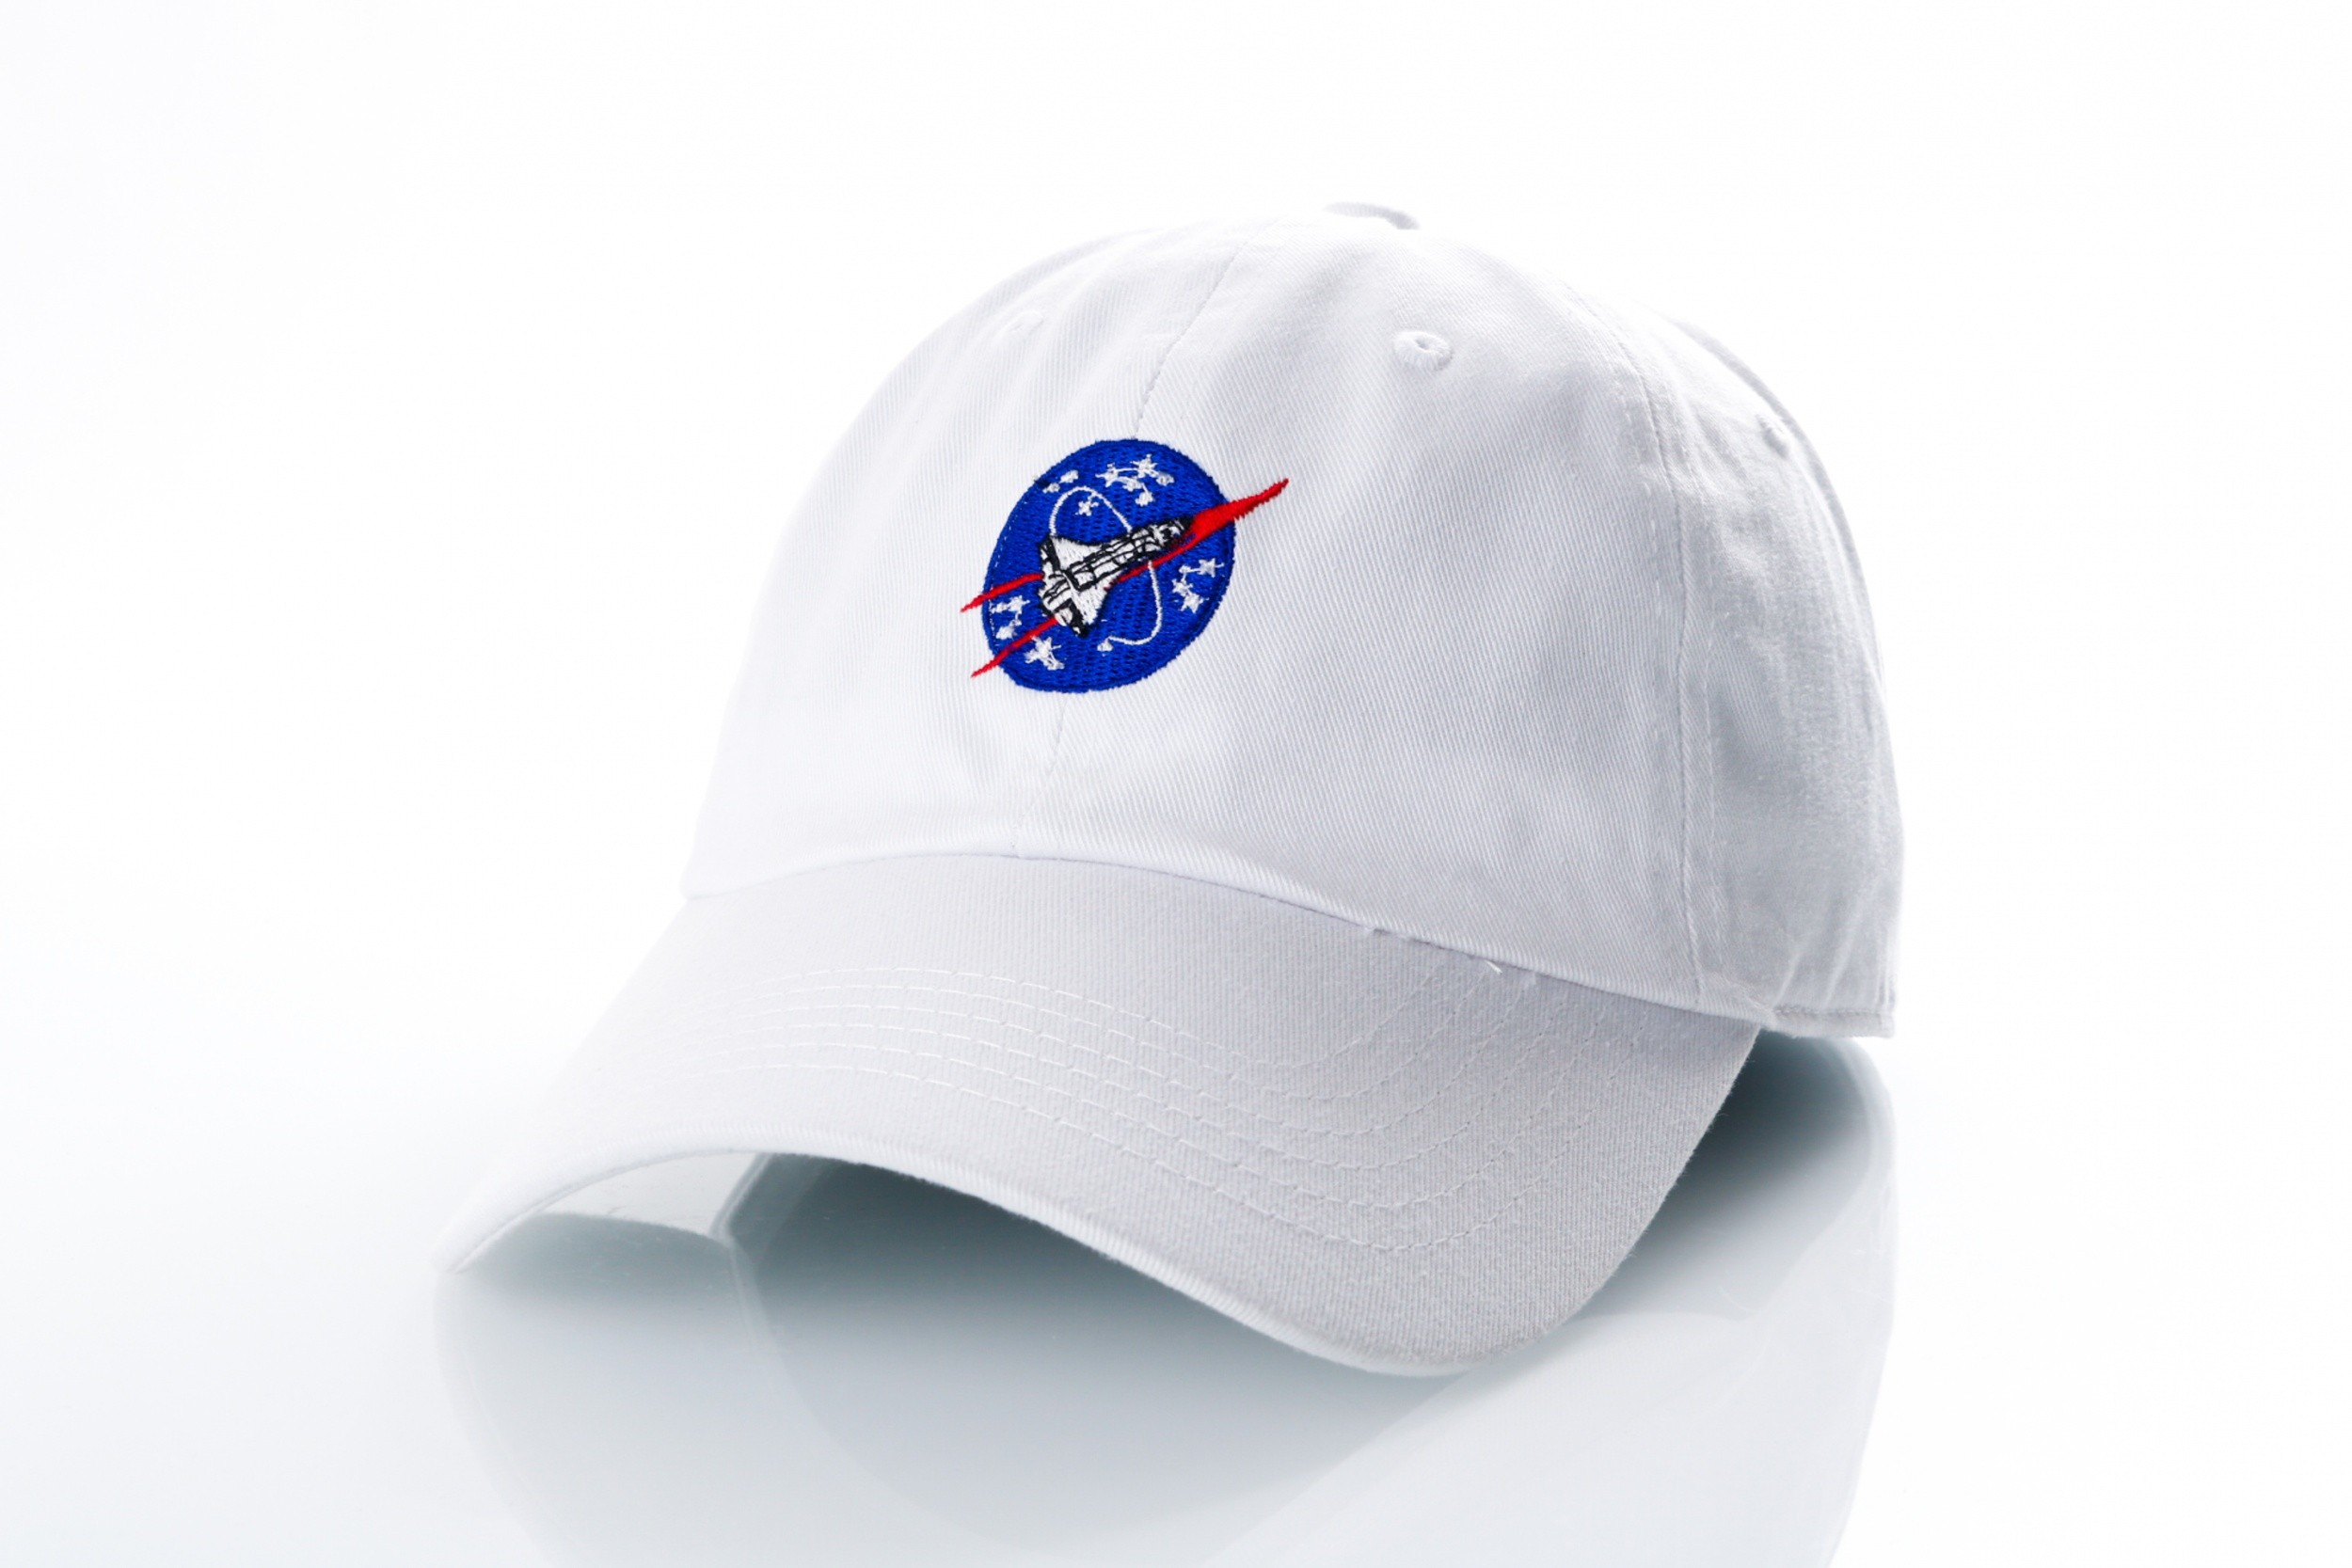 Afbeelding van Ethos Space KBSV-036 white KBSV-036 dad cap white